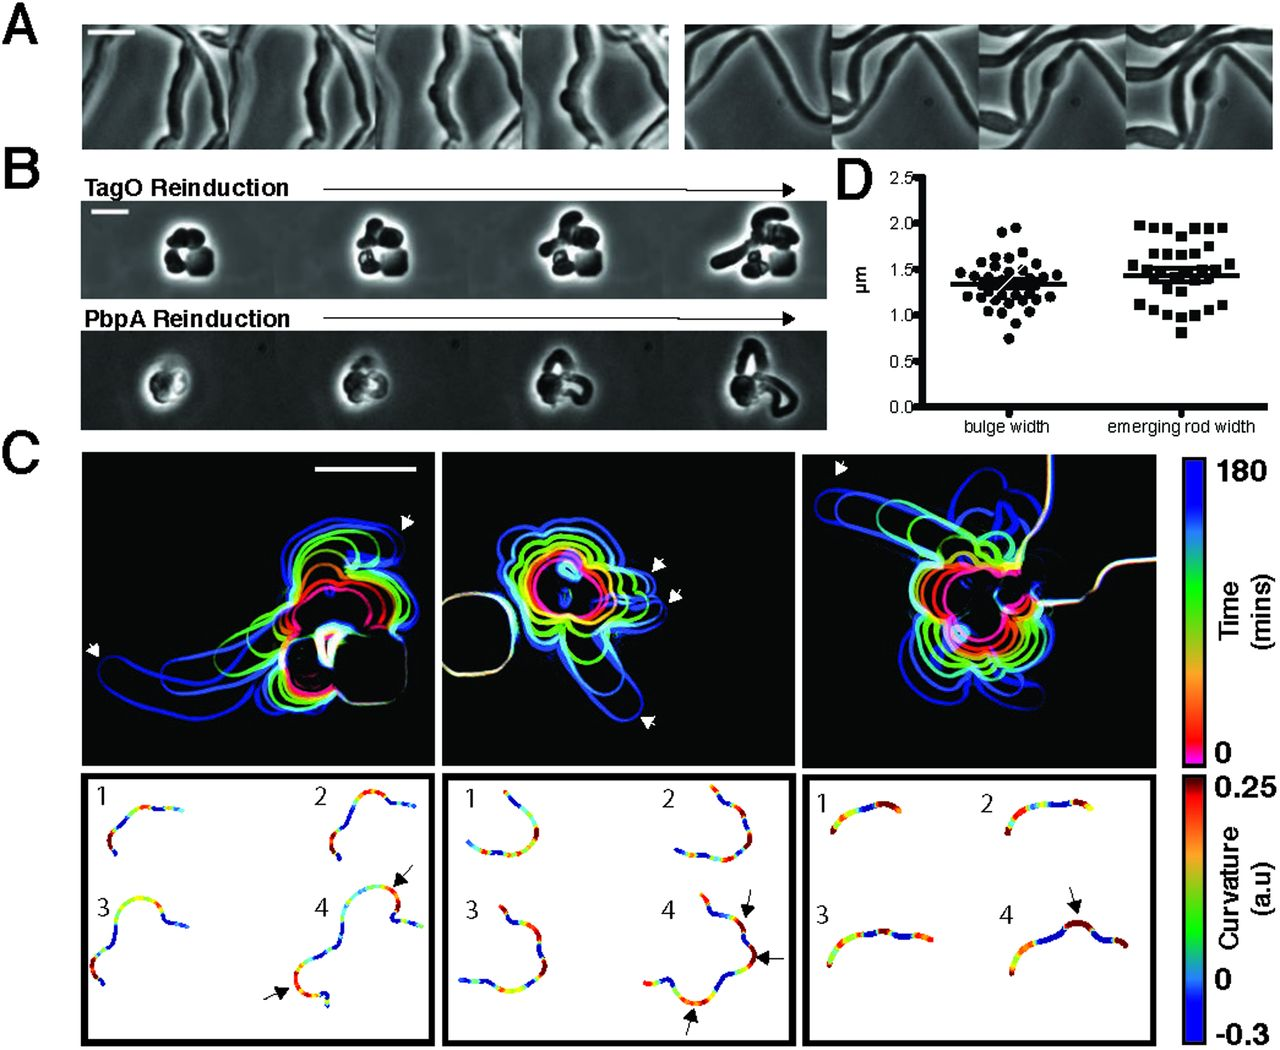 MreB filaments create rod shape by aligning along principal